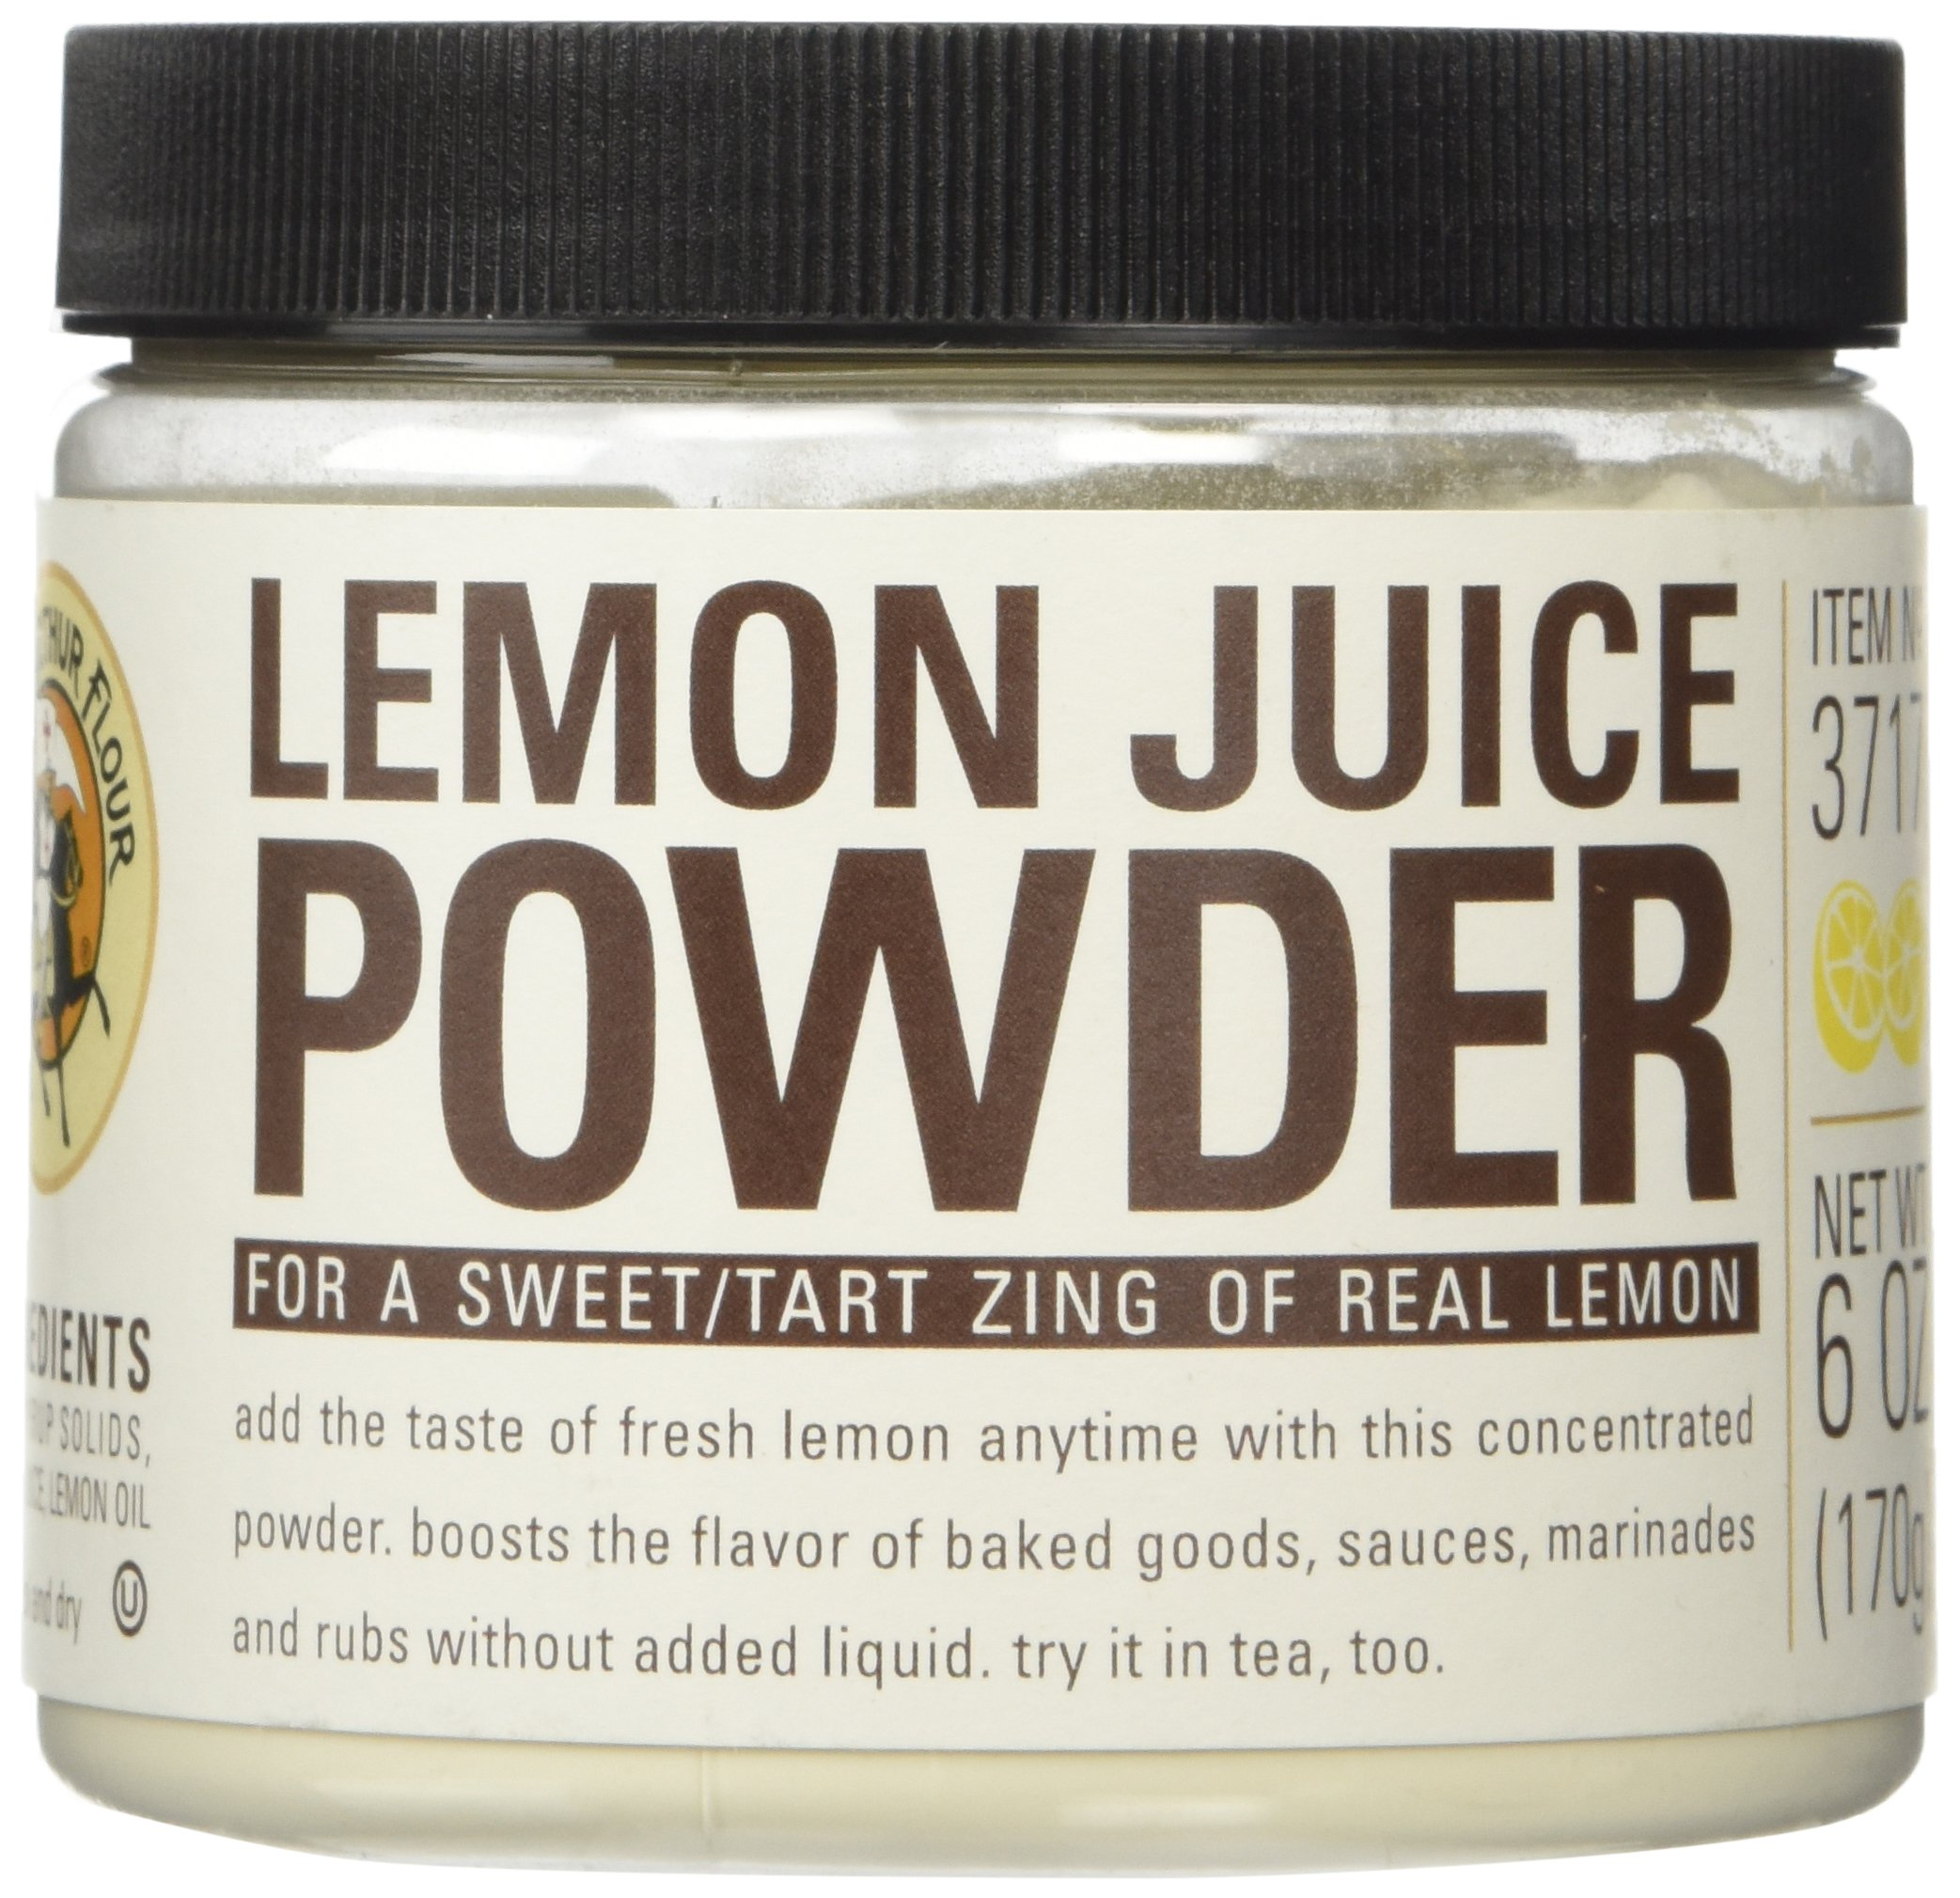 King Arthur Flour Lemon Juice Fruit Powder - 6 oz. by King Arthur Flour (Image #1)